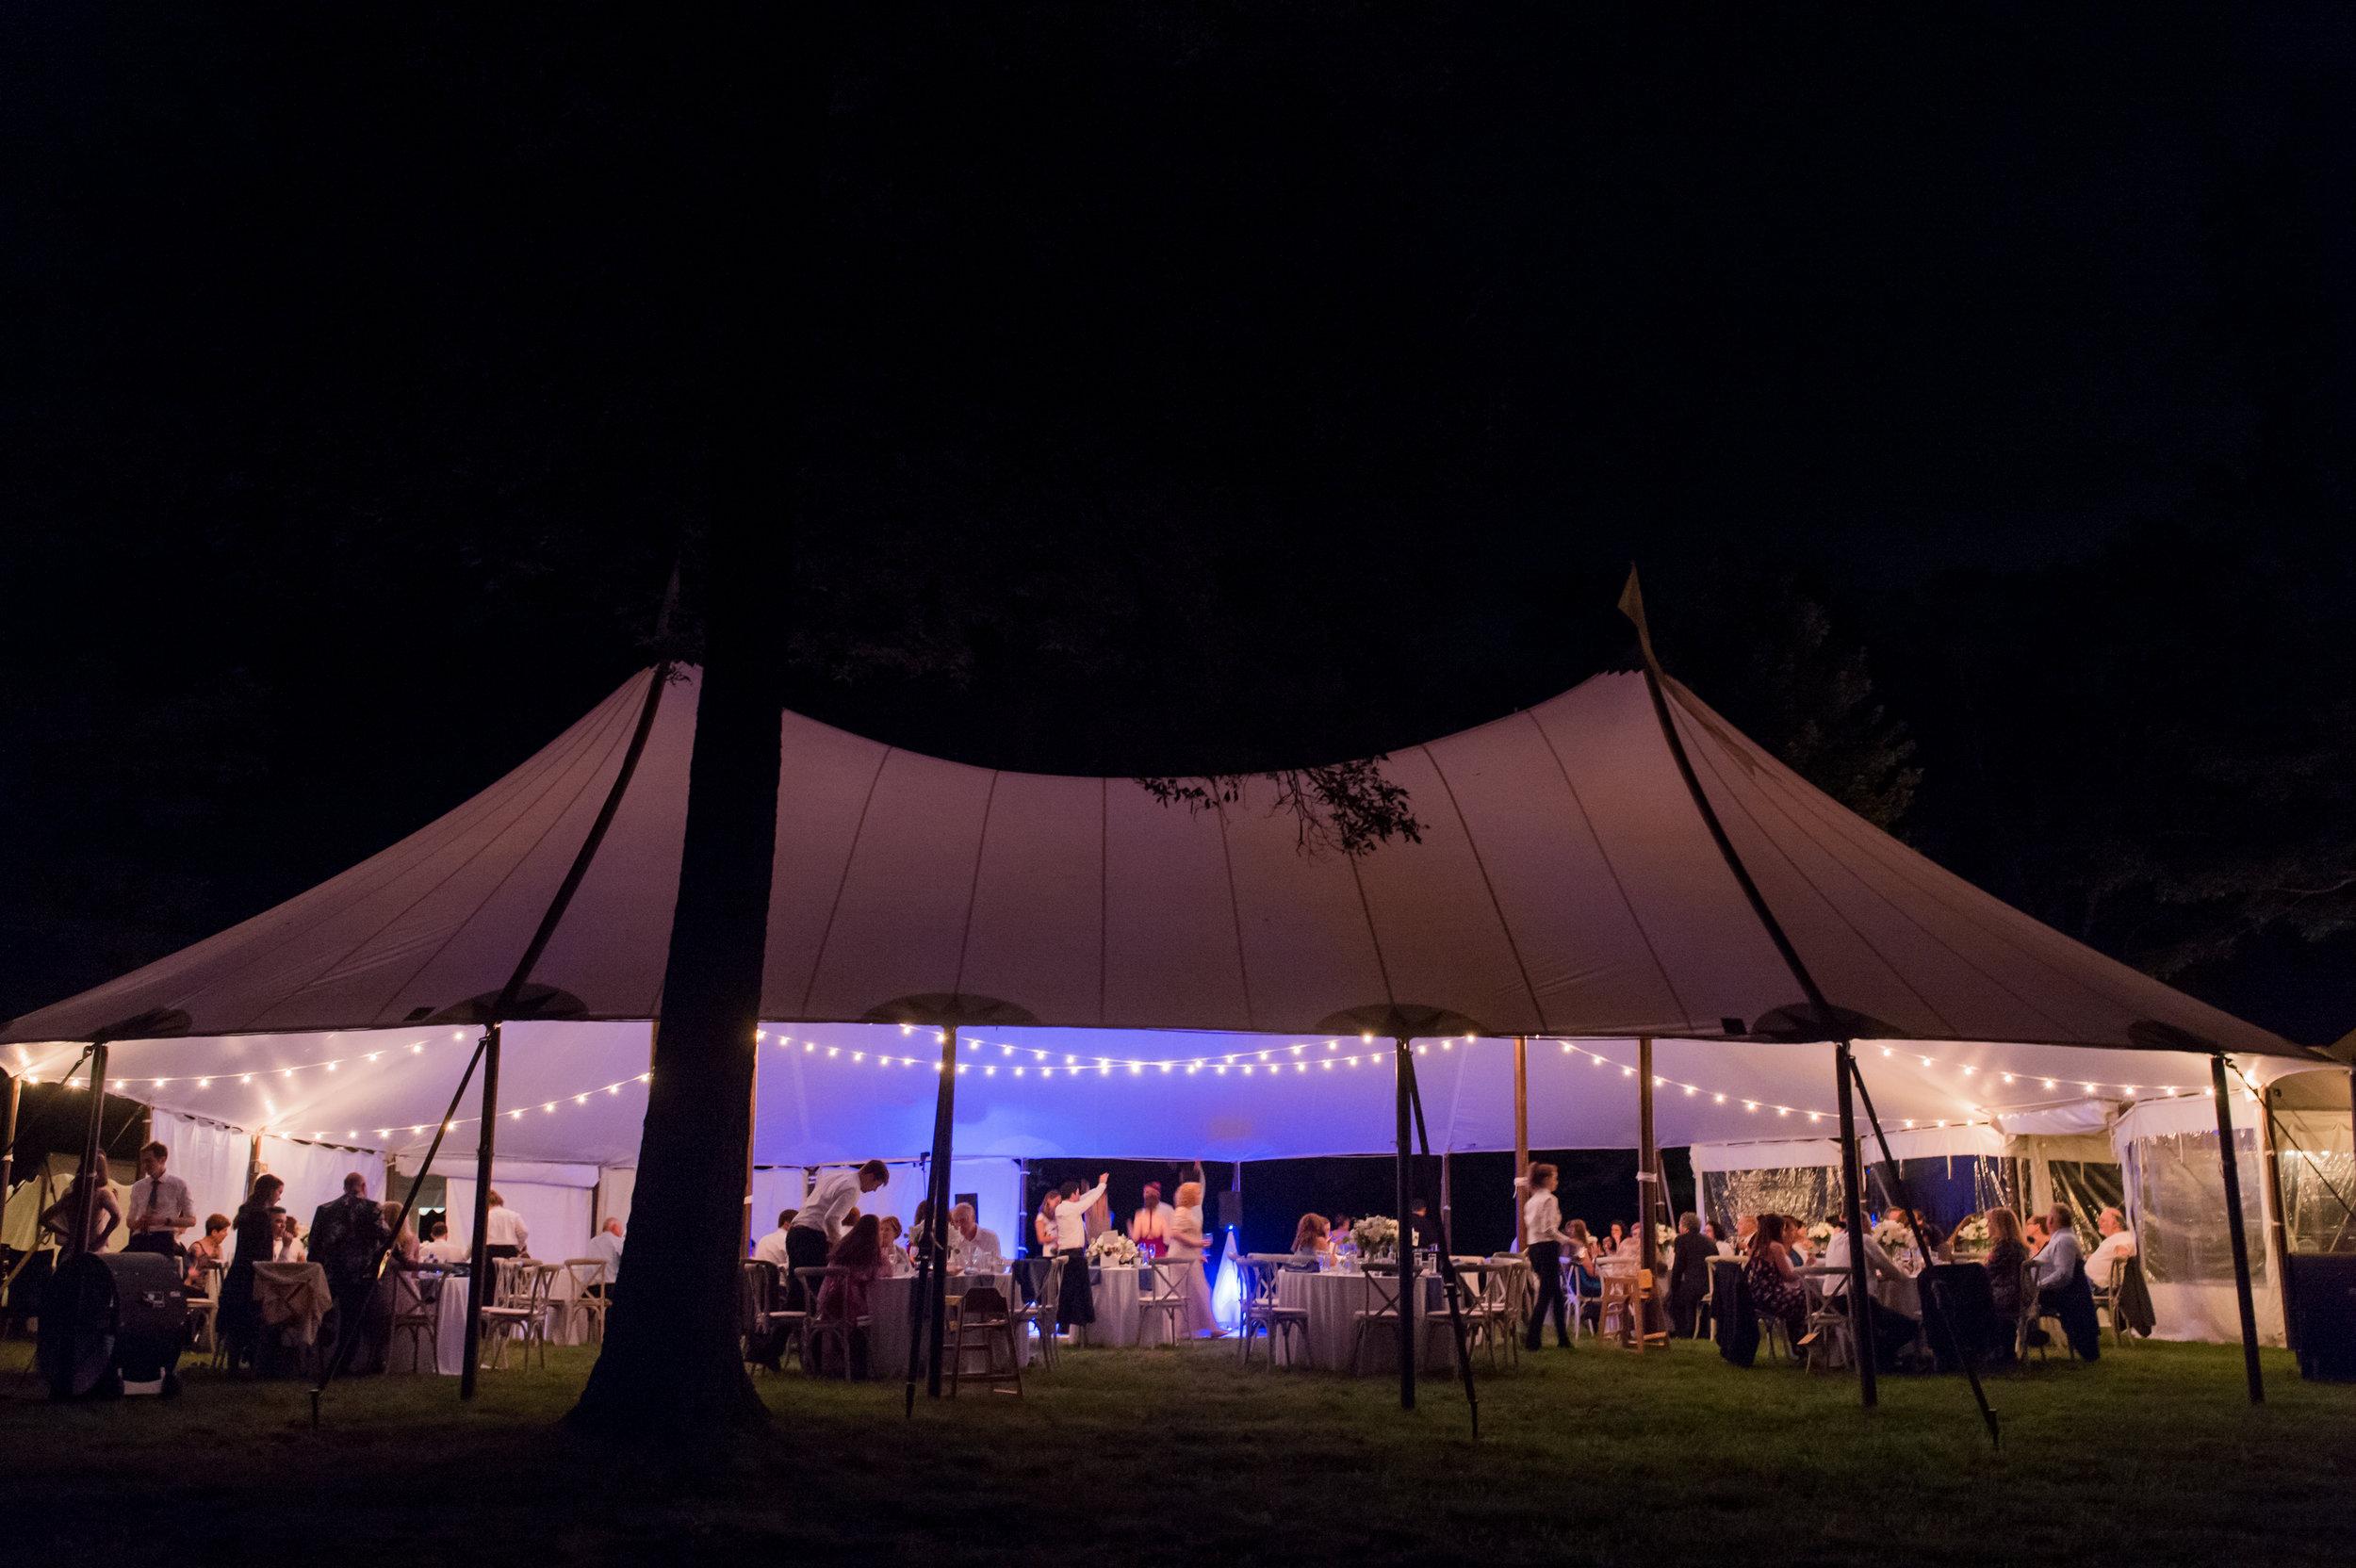 Stefy Hilmer Photograhy- wedding tent at night.jpg